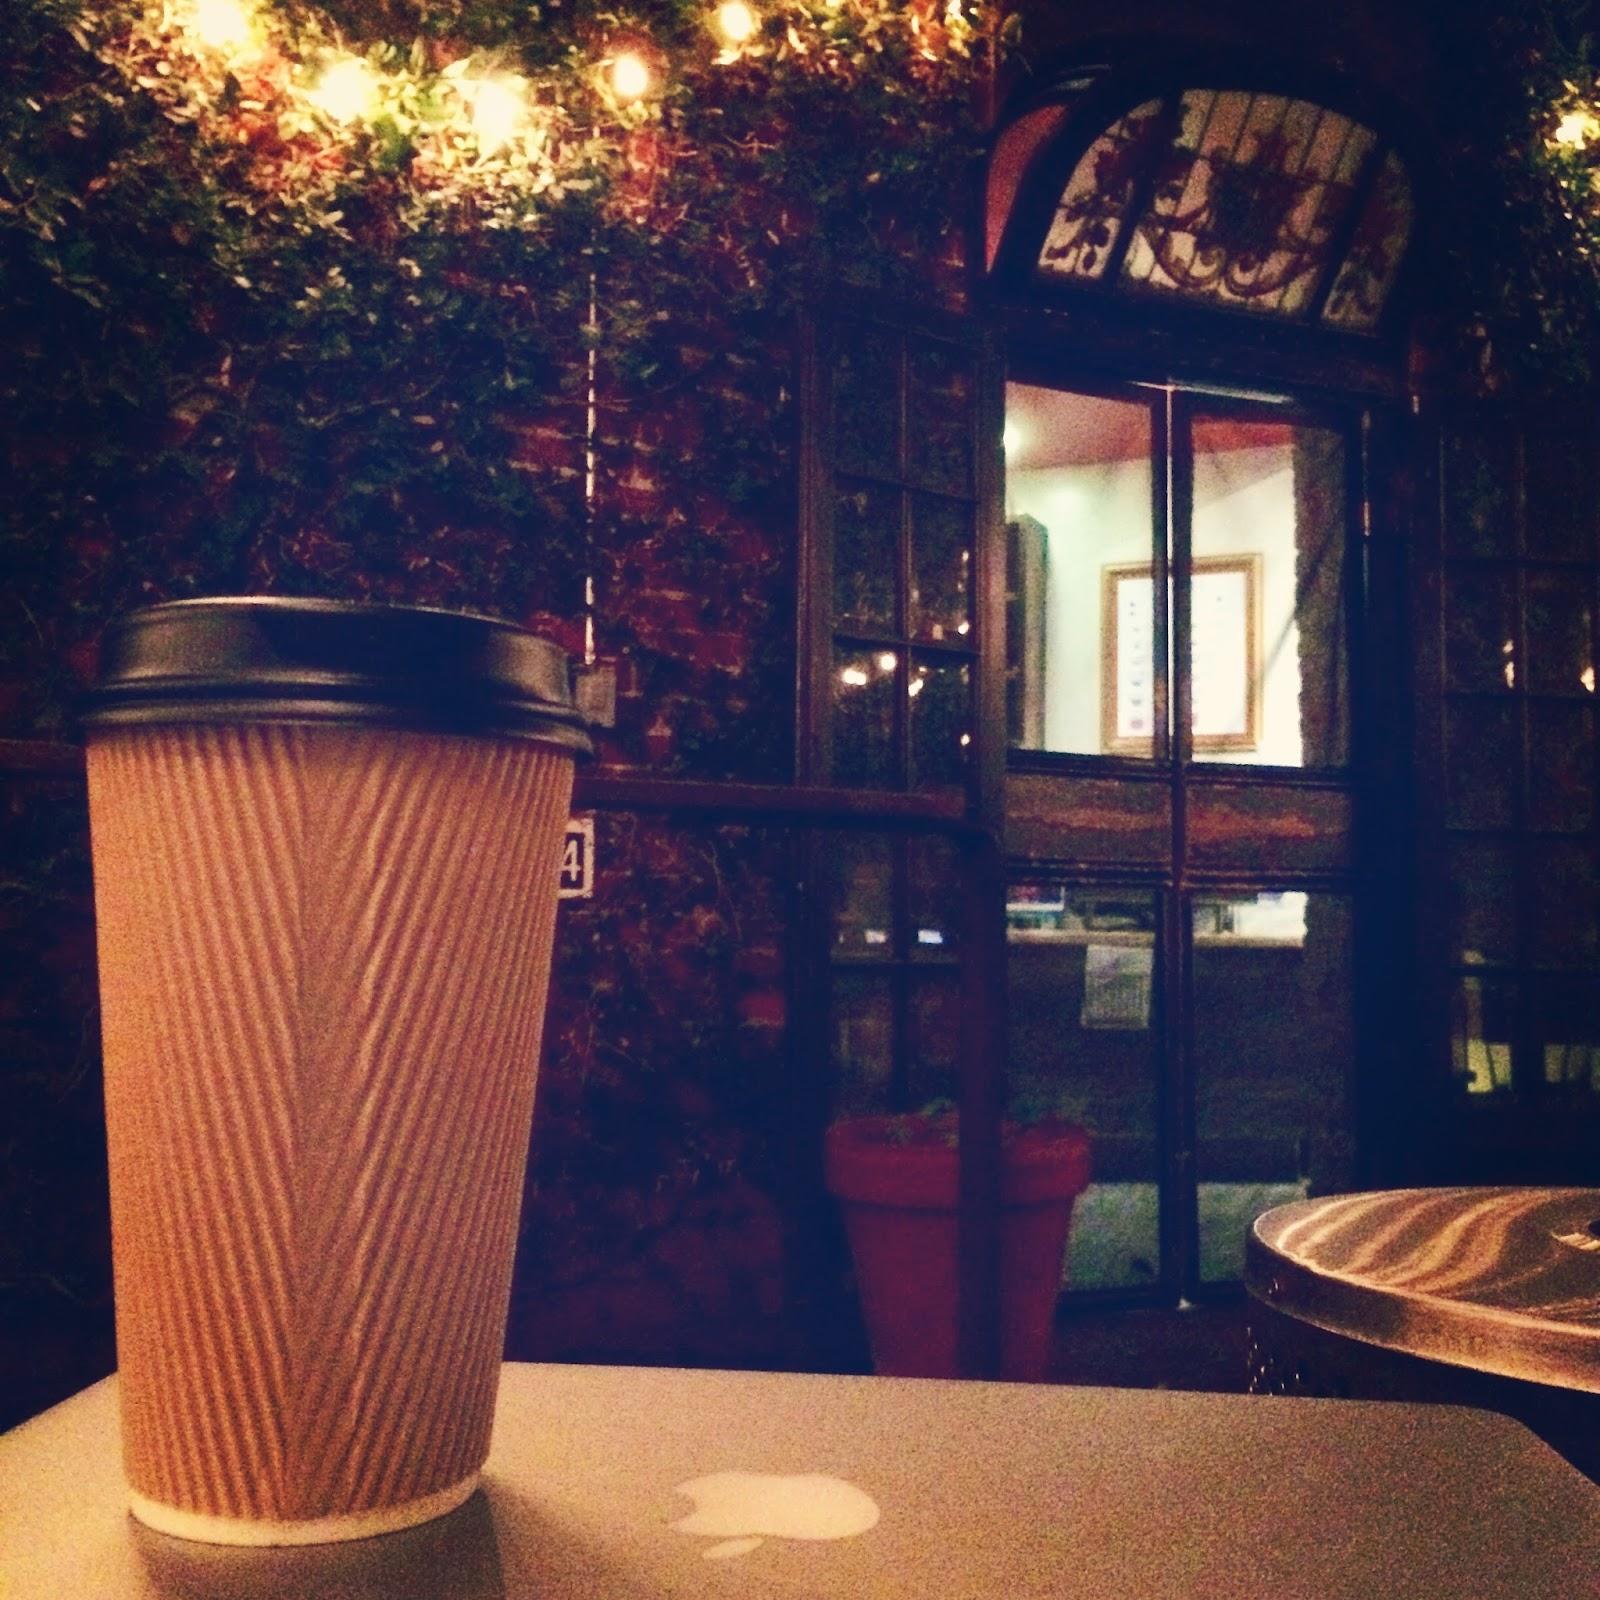 LA coffee shop